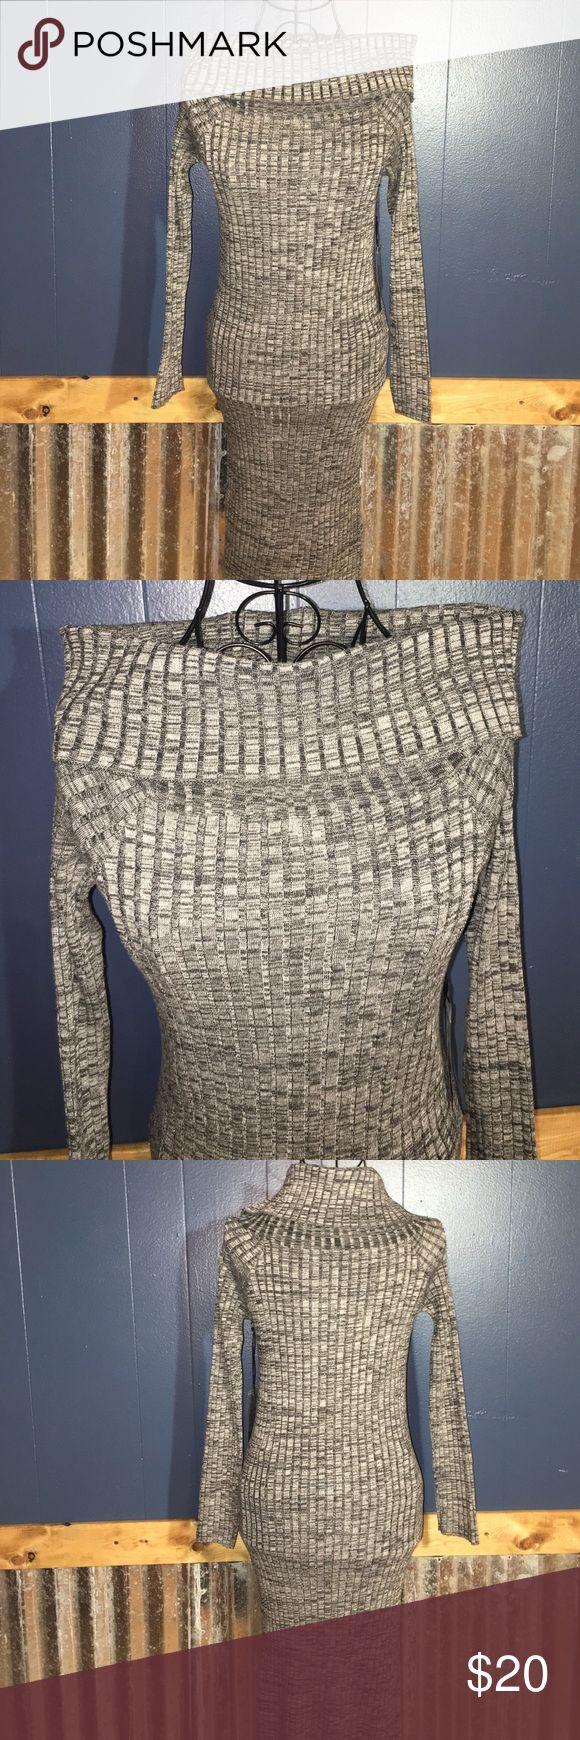 "Long Sleeve Turtleneck Dress NWT. Gray long sleeve turtleneck sweater dress. 35"" from shoulder to bottoms of dress. Poof Apparel Dresses Long Sleeve"